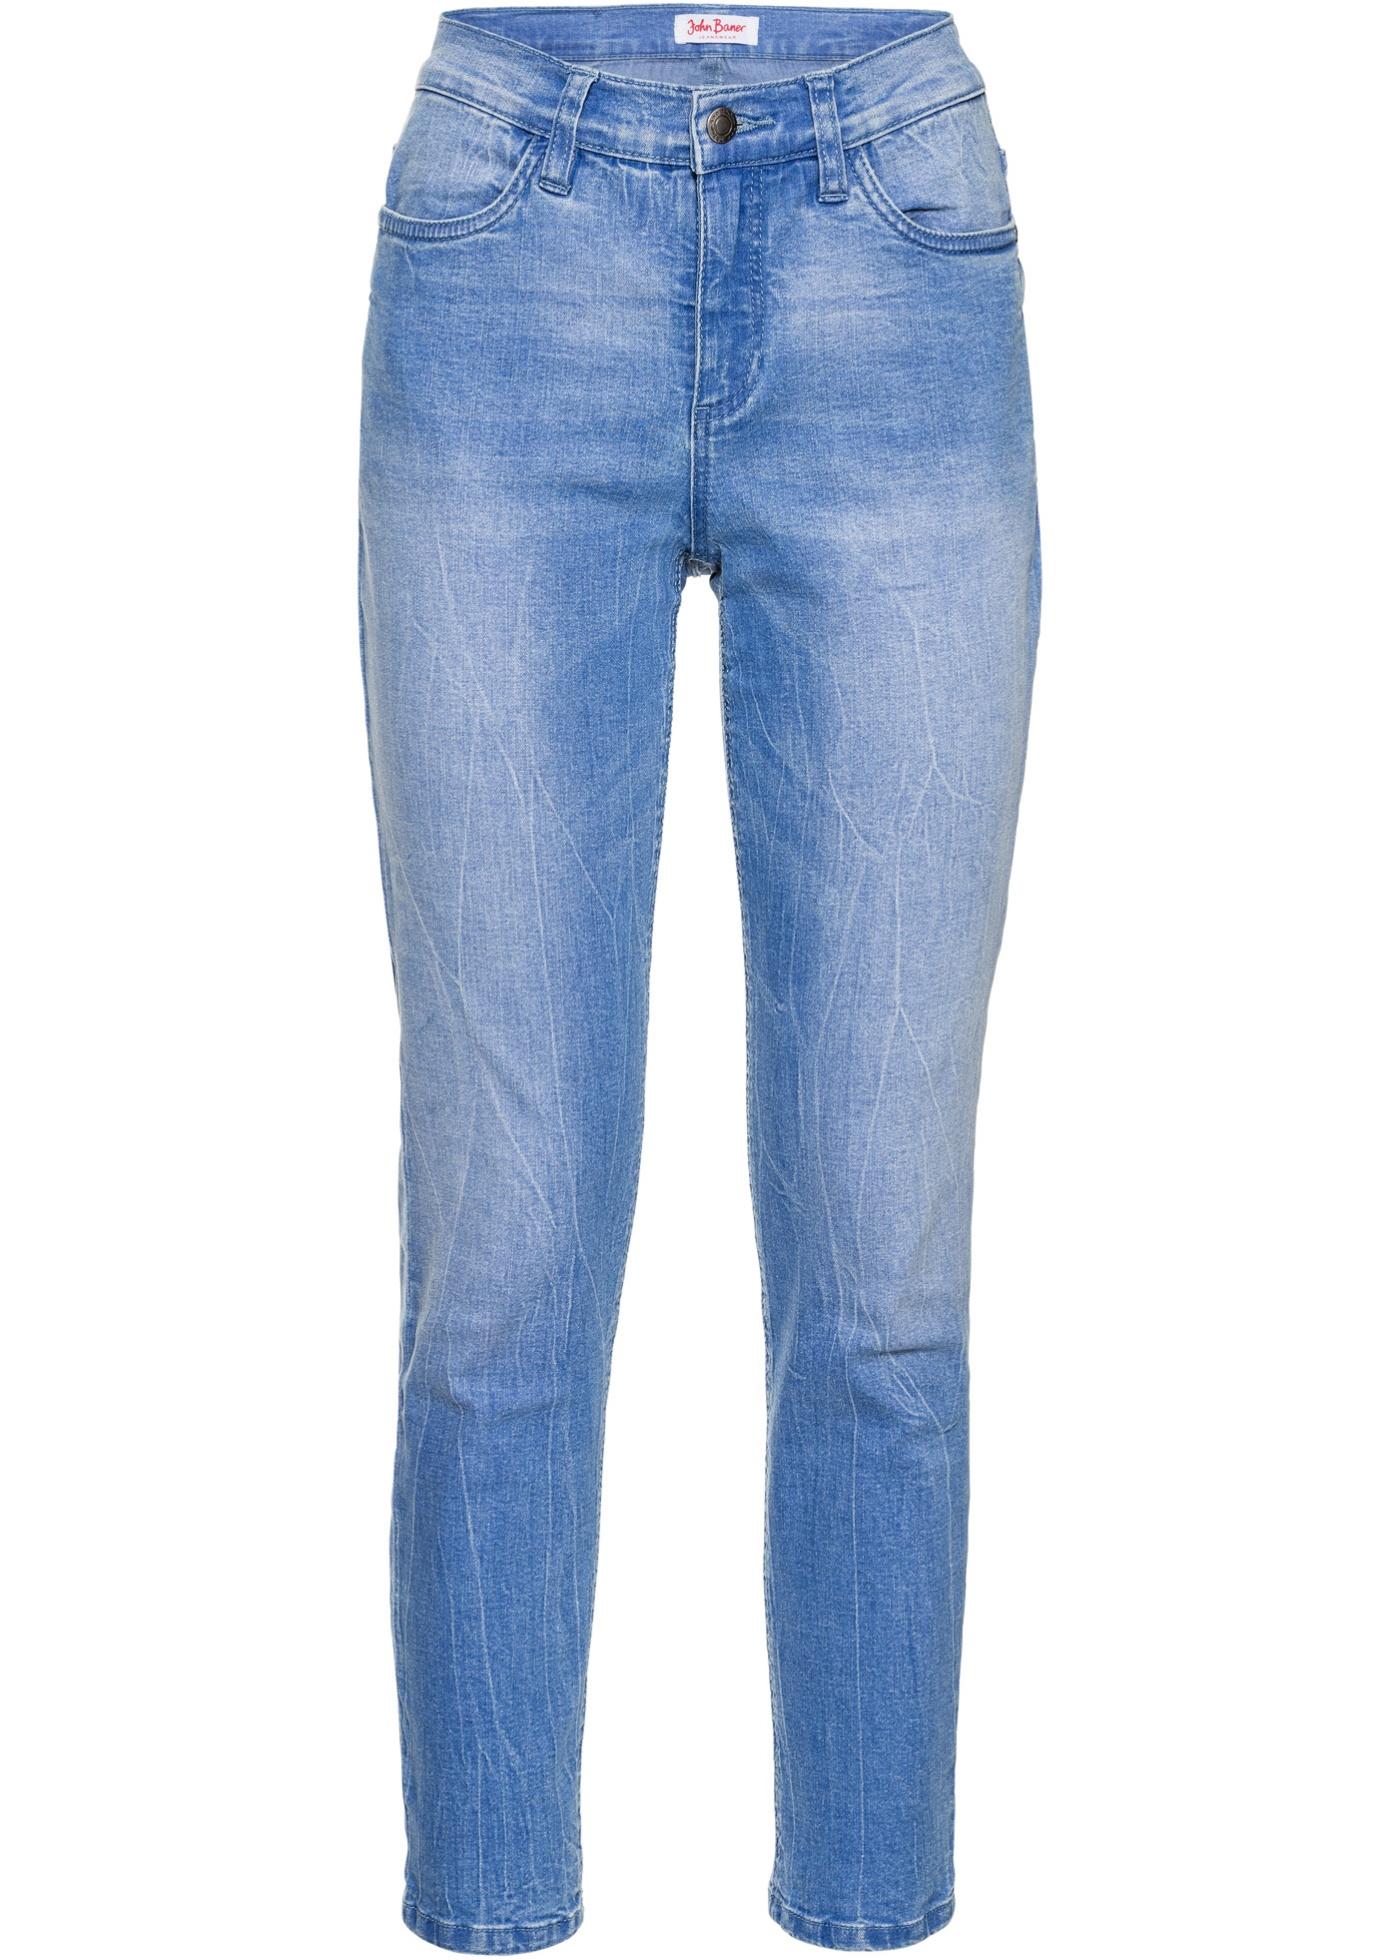 Jean soft stretch 7/8 SLIM